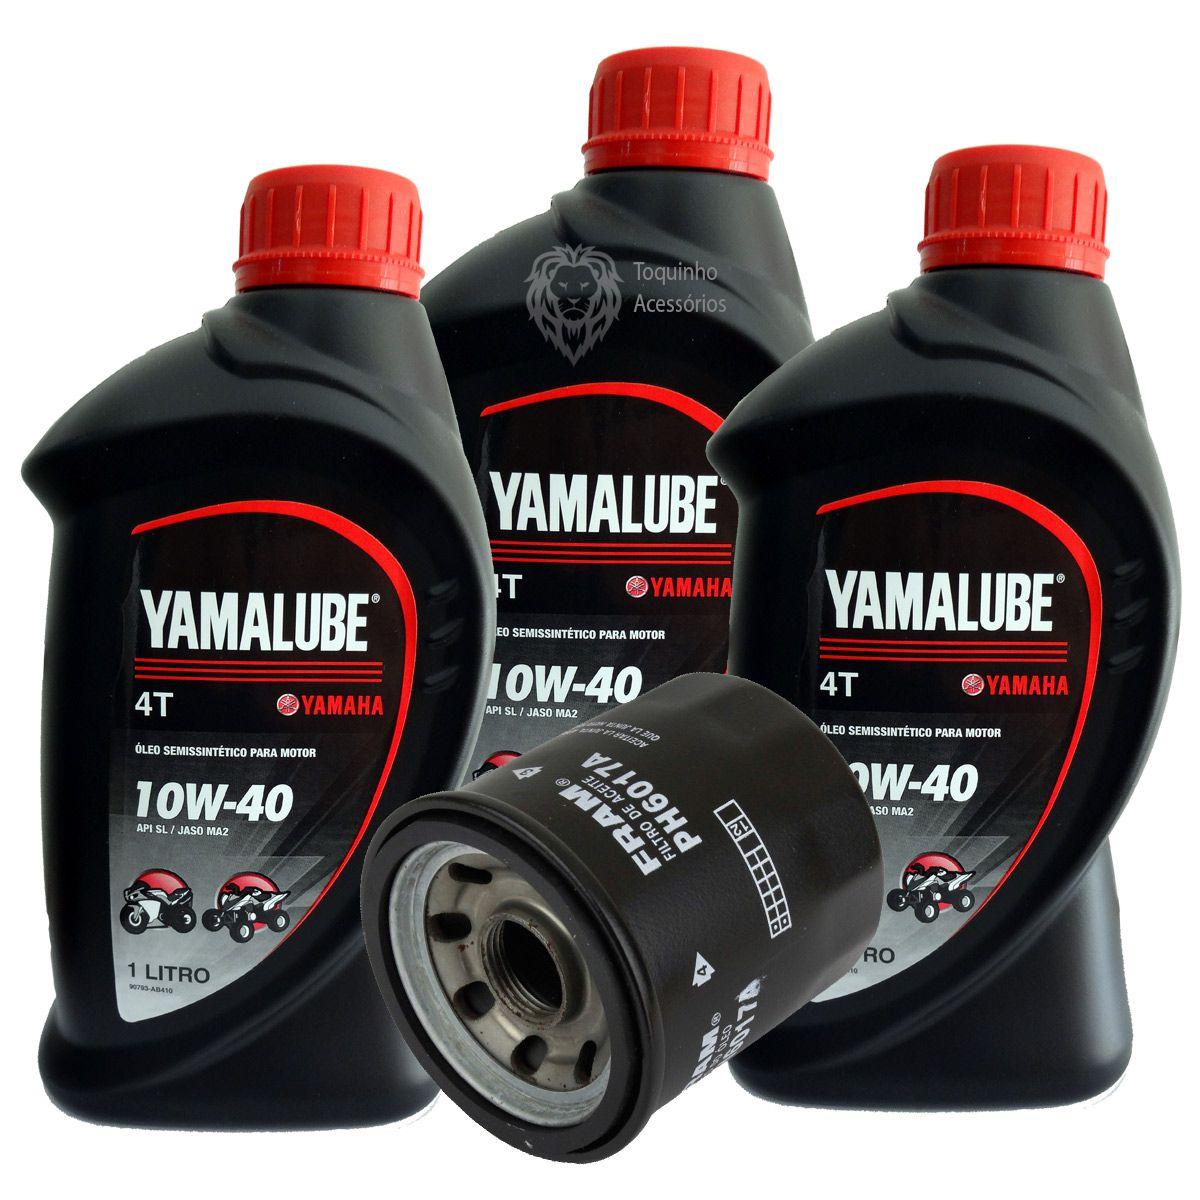 Kit Filtro De Óleo Yamaha Xj6/fz600 Fram e 3 Litros Yamalube 4T 10w40 Semi-sintético